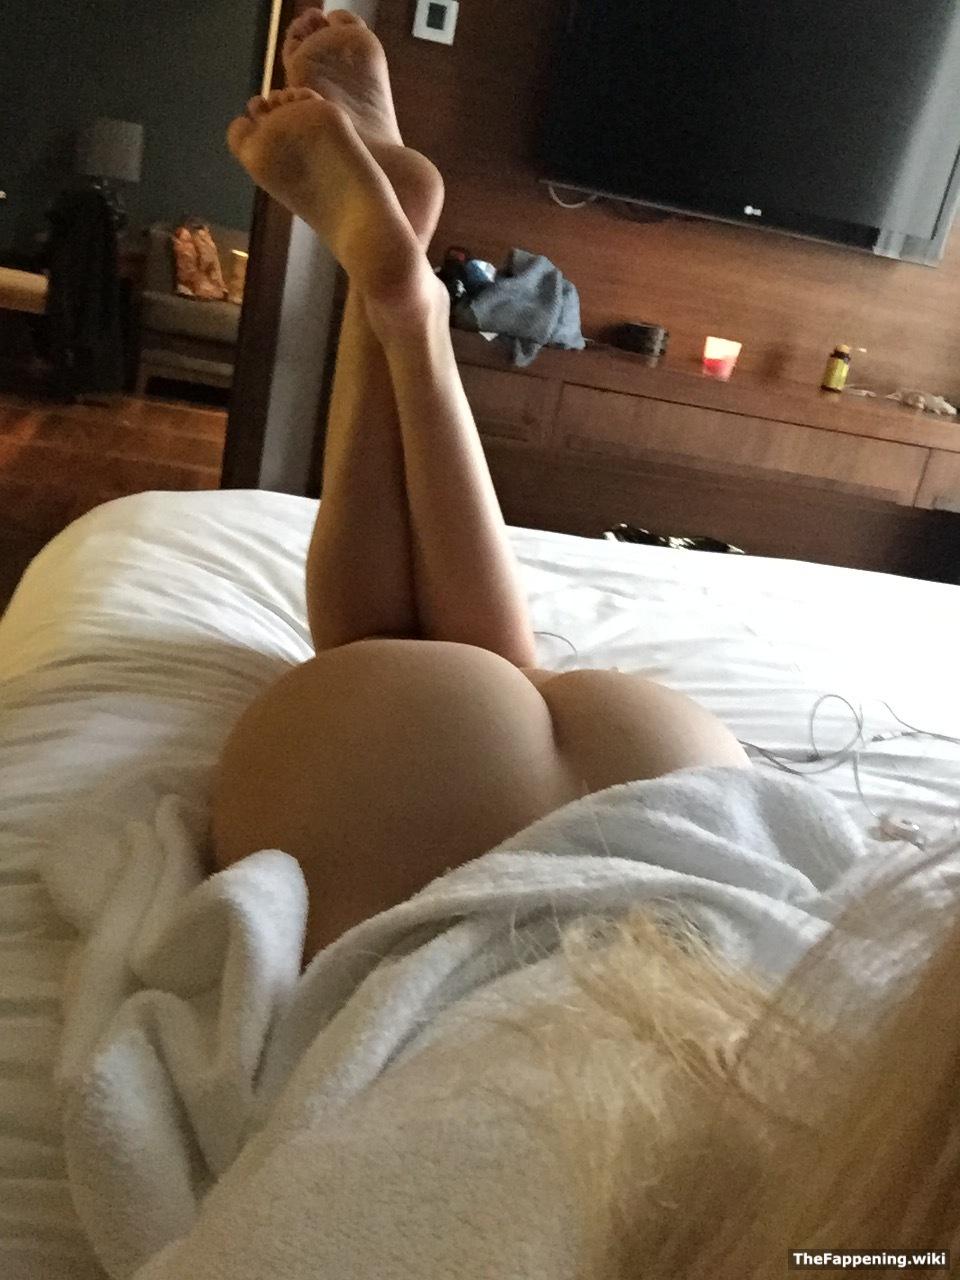 Samara Weaving Nude Pics & Vids - The Fappening